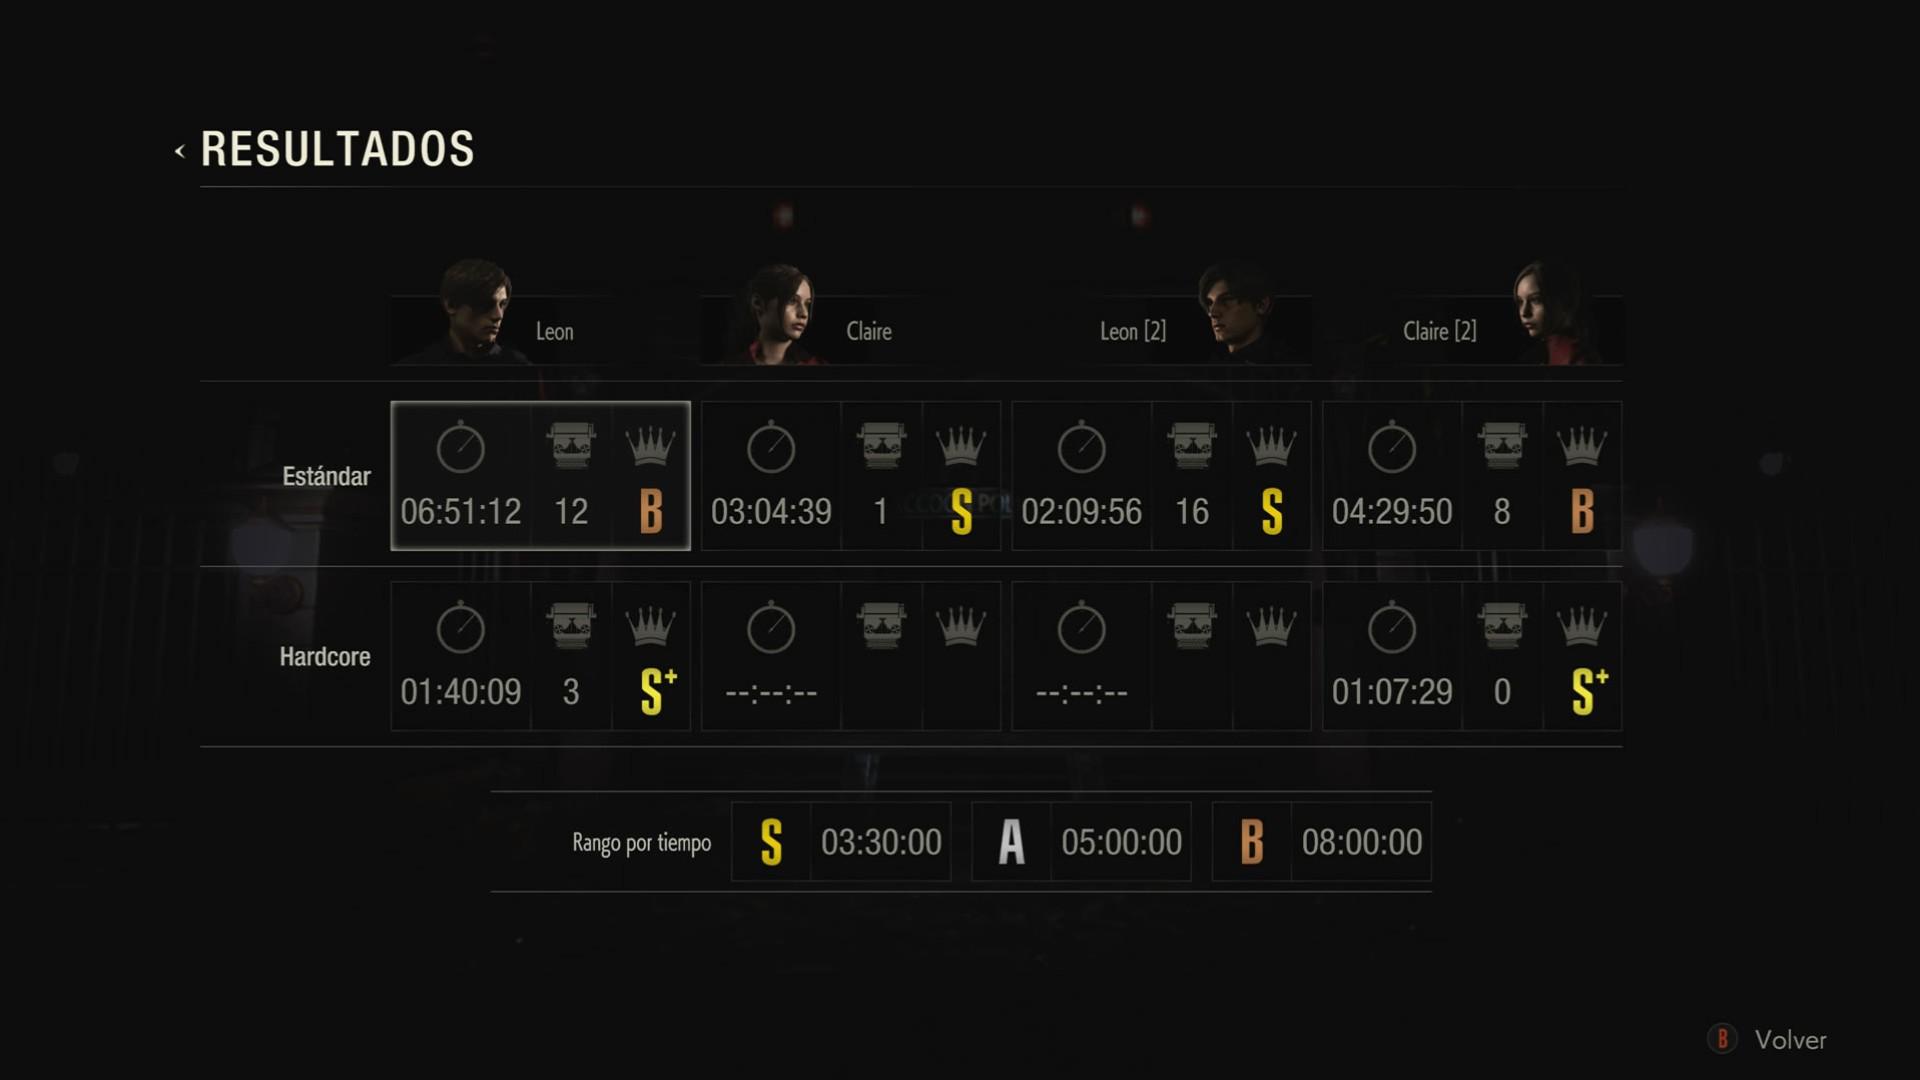 Como Sacar Rango S Y S En Resident Evil 2 Remake Meristation